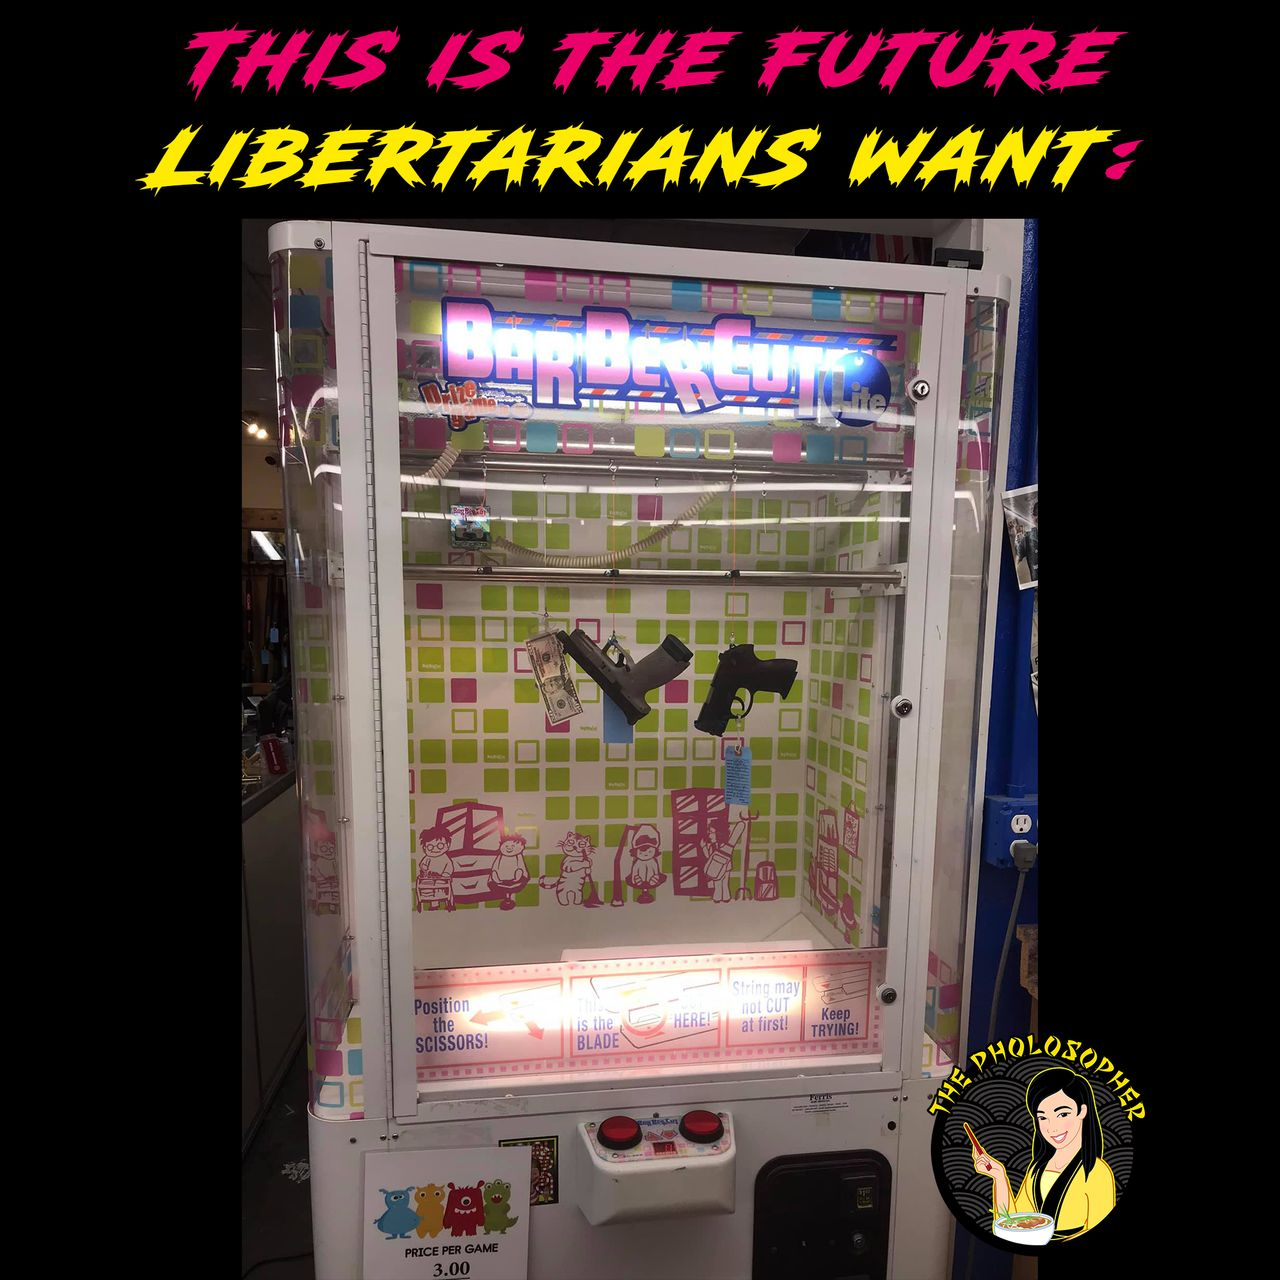 future_libertarians_want.jpg